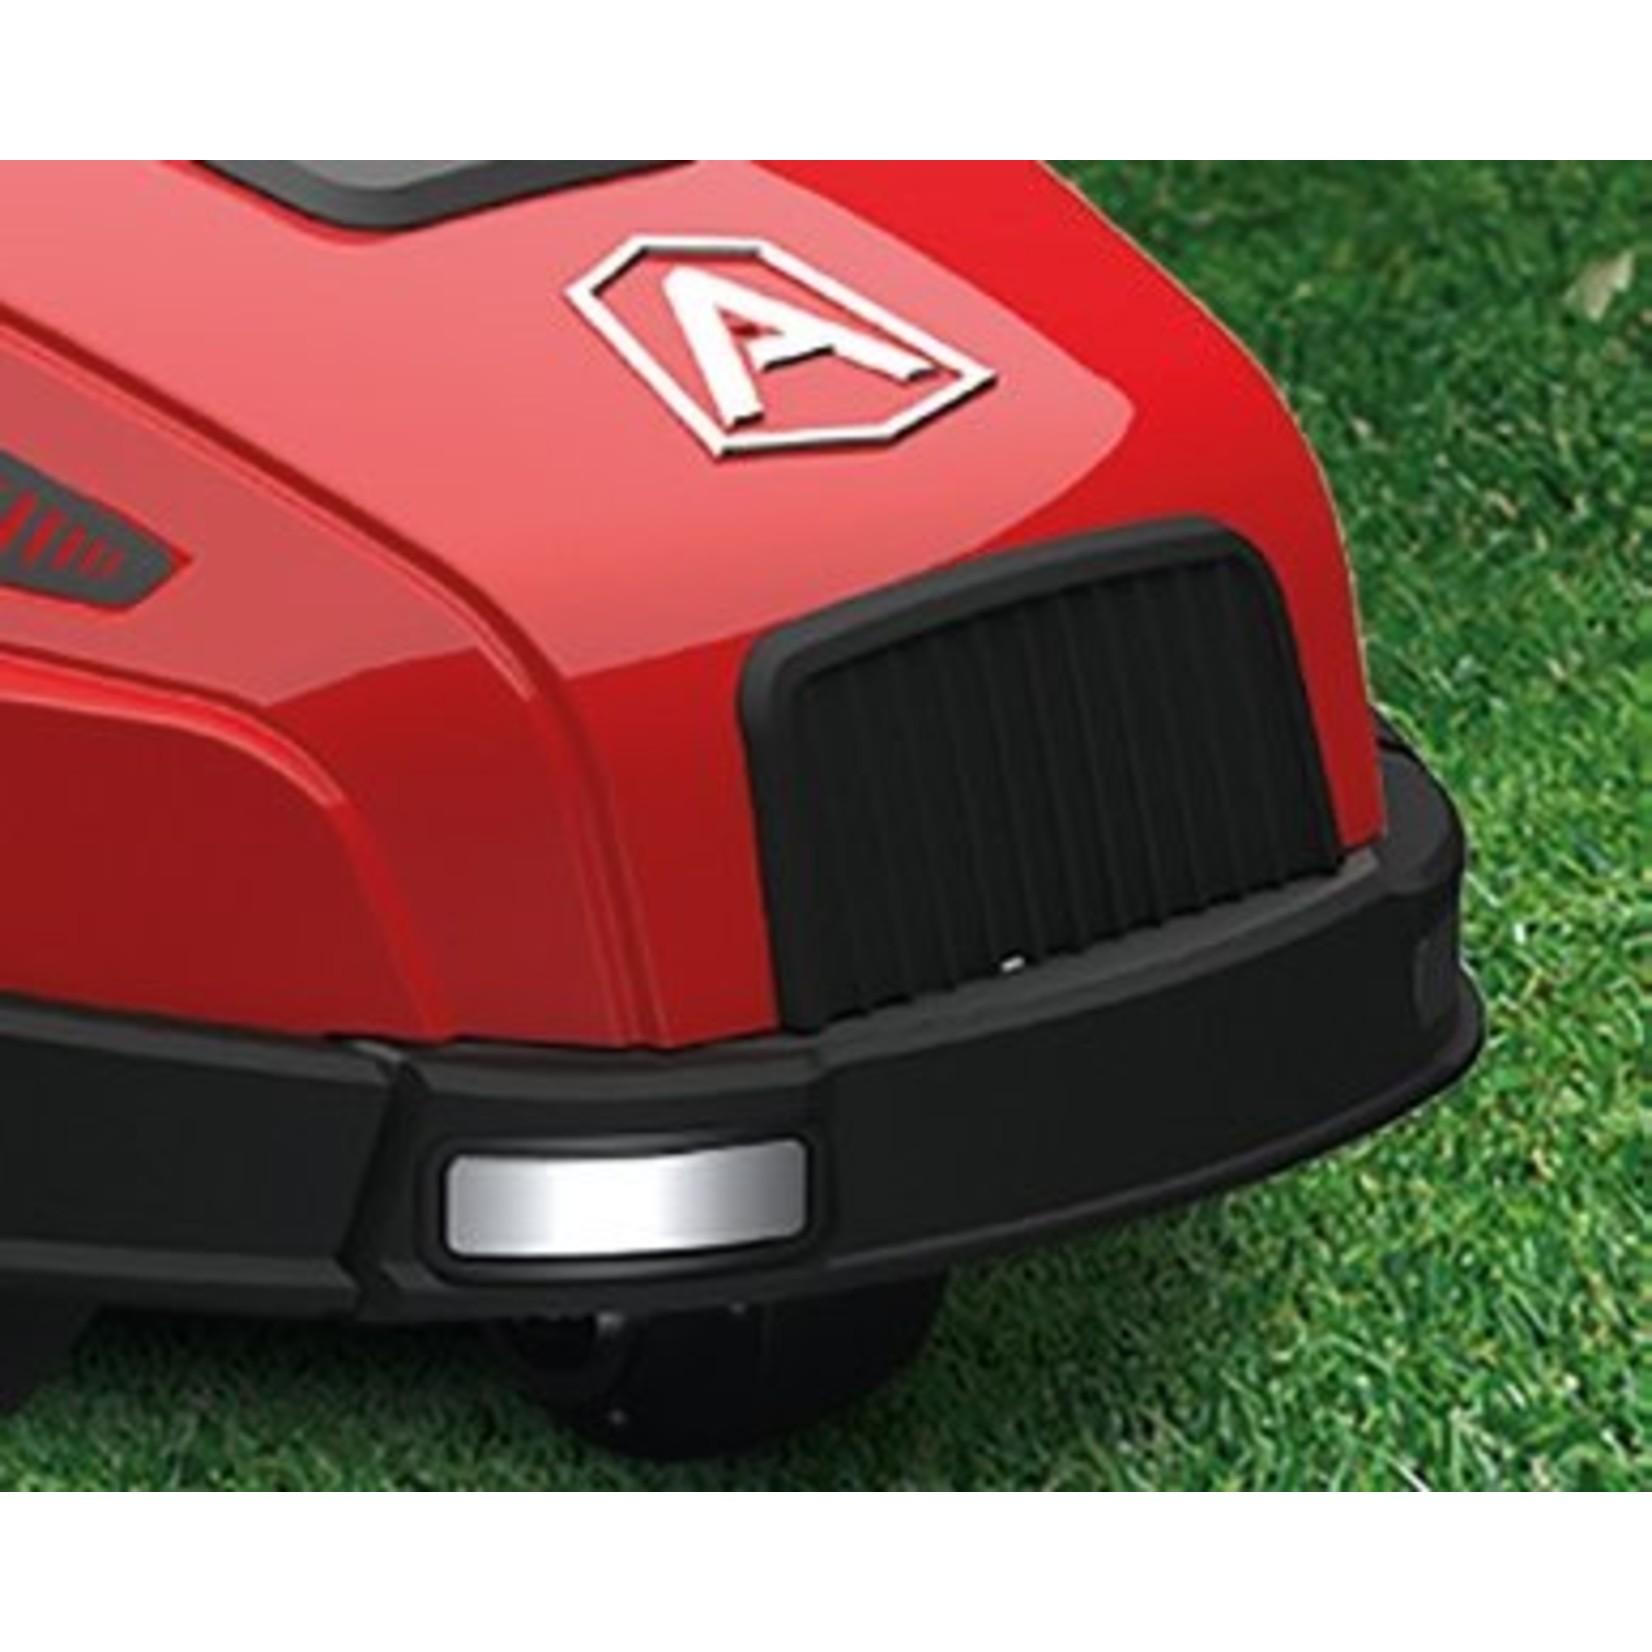 Ambrogio Ambrogio Proline L35 Basic Rasenmähroboter Modell 2021